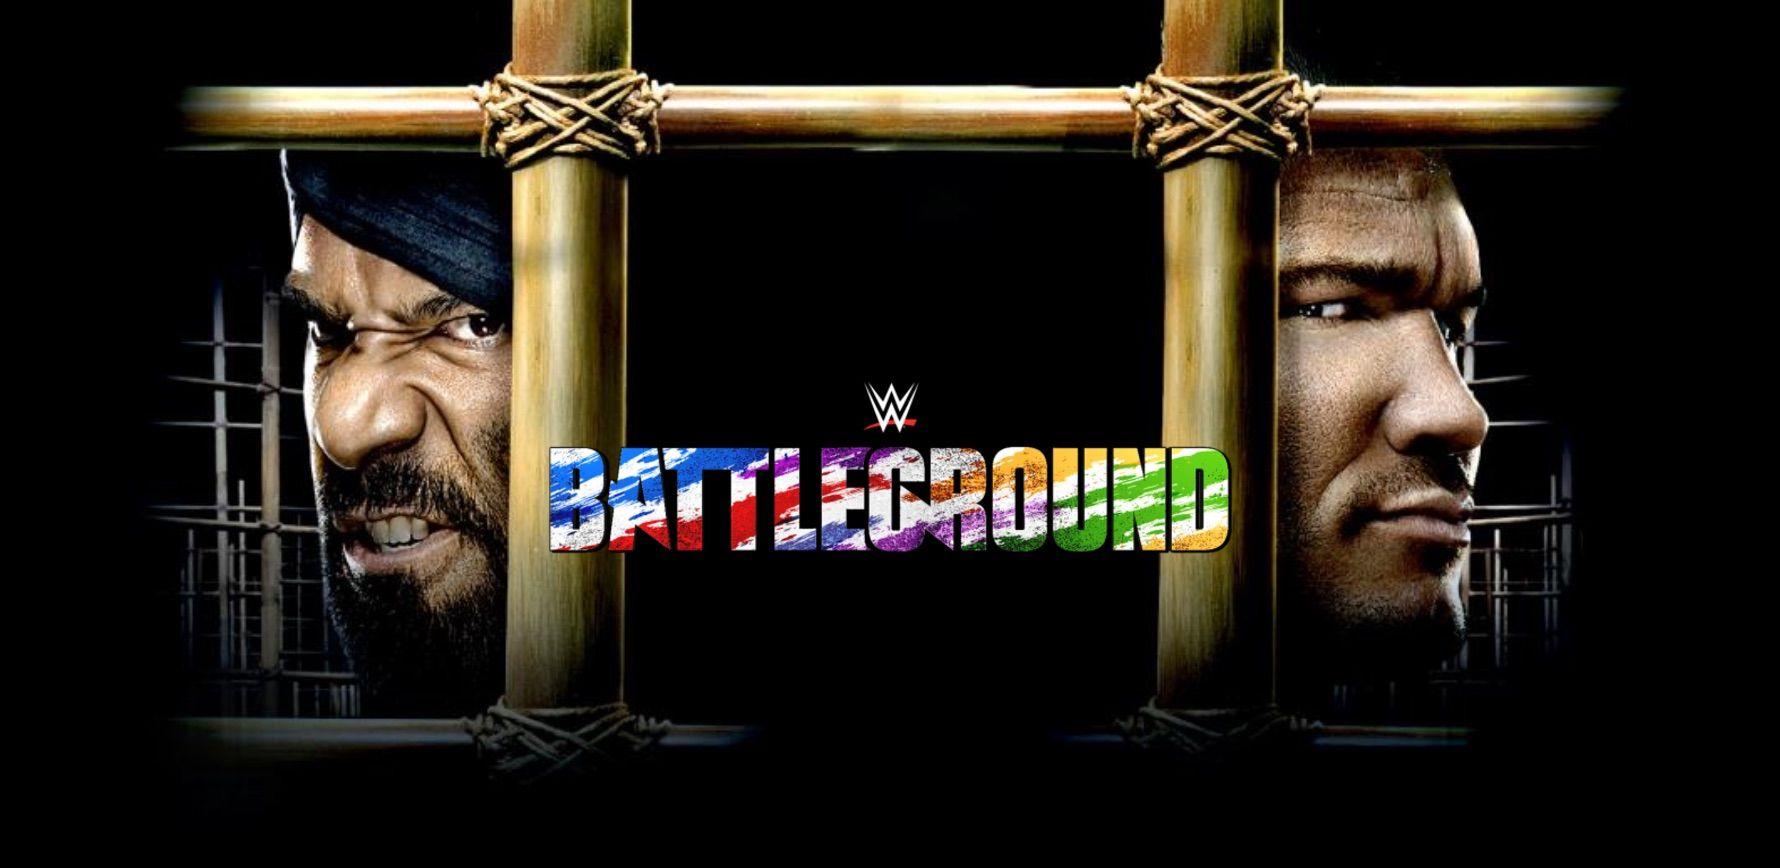 WWE Battleground Free Live Video Stream - | Live video